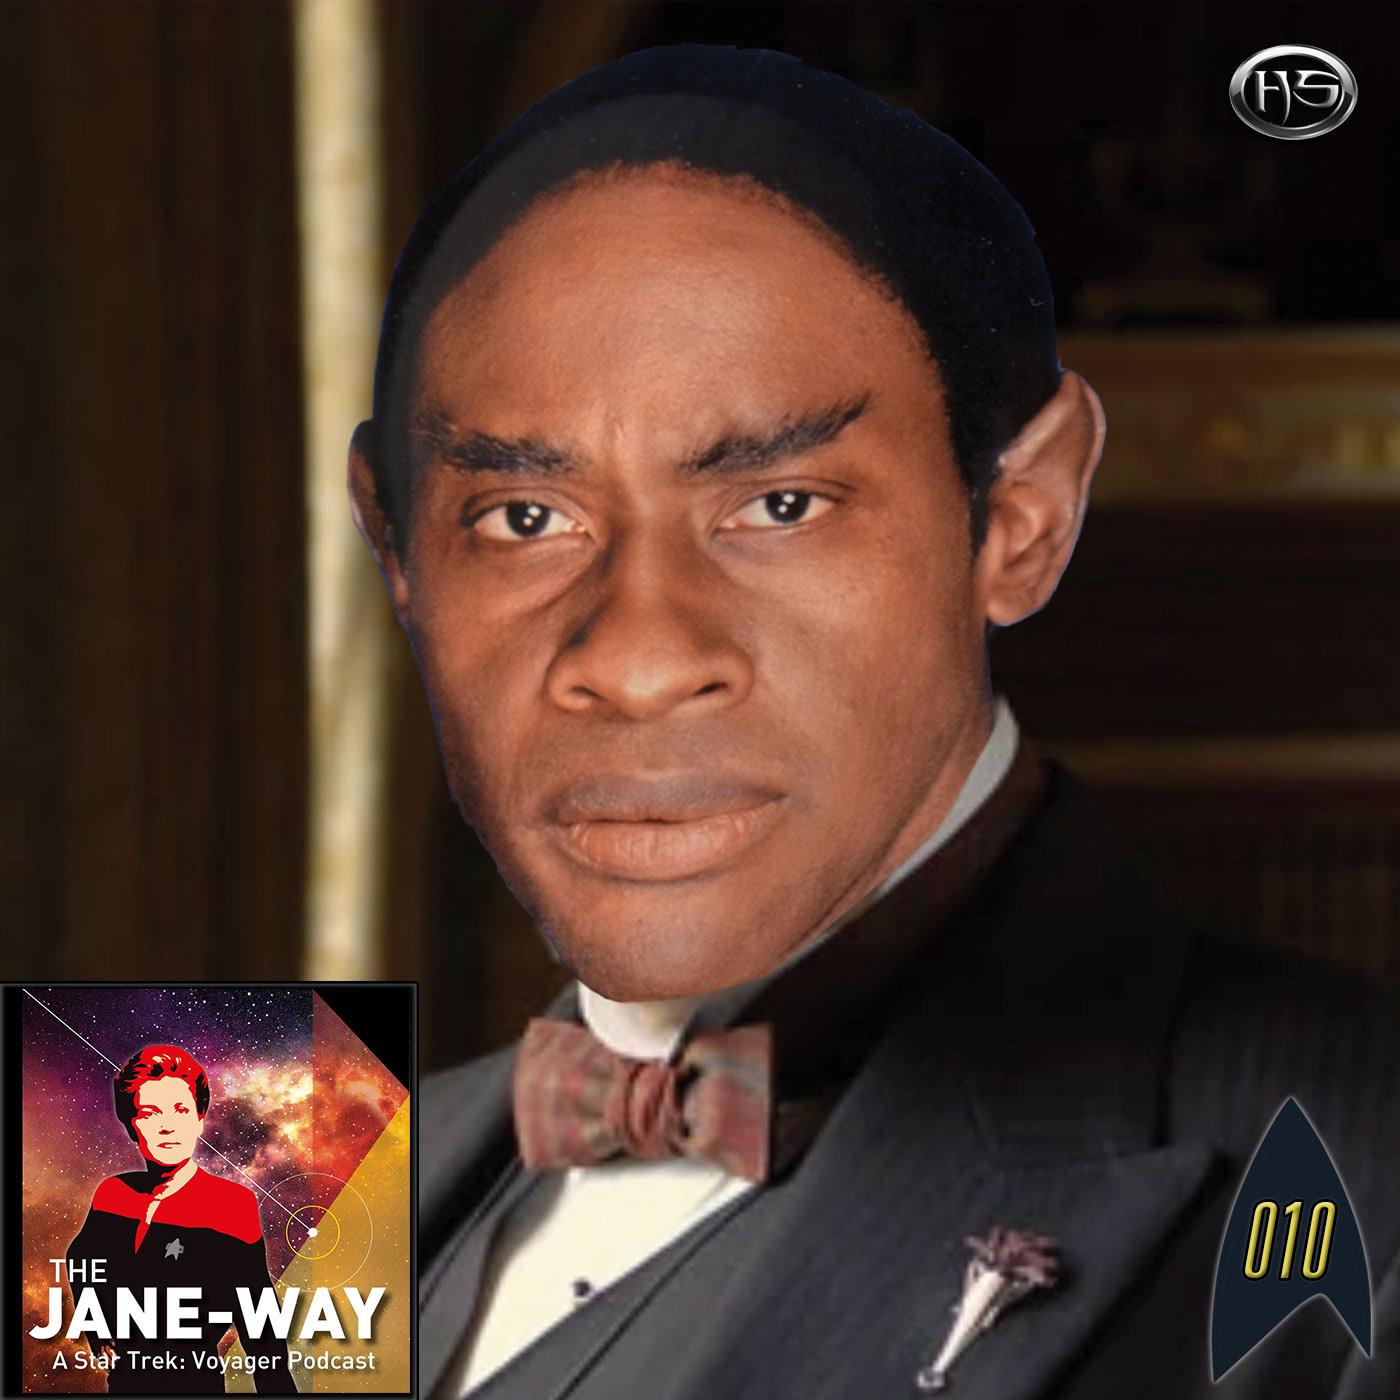 The Jane-Way Episode 10